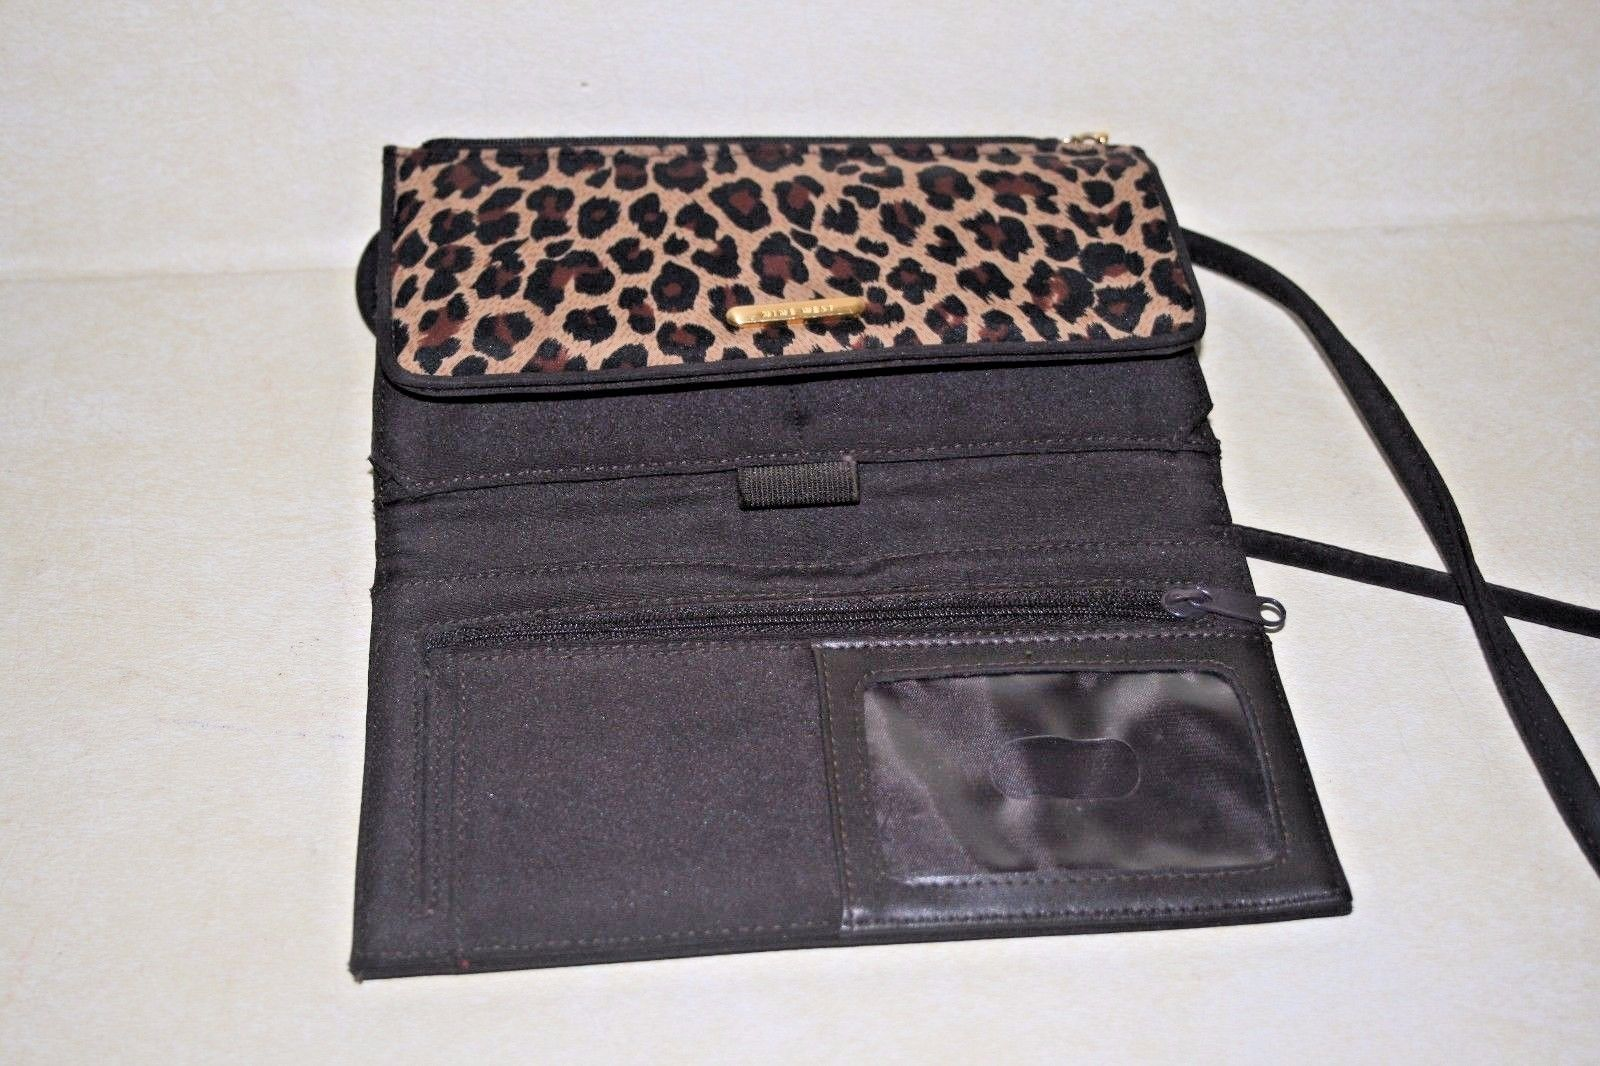 NINE WEST Polyester Fabric Brown & Animal Print Cross Body Shoulder Bag